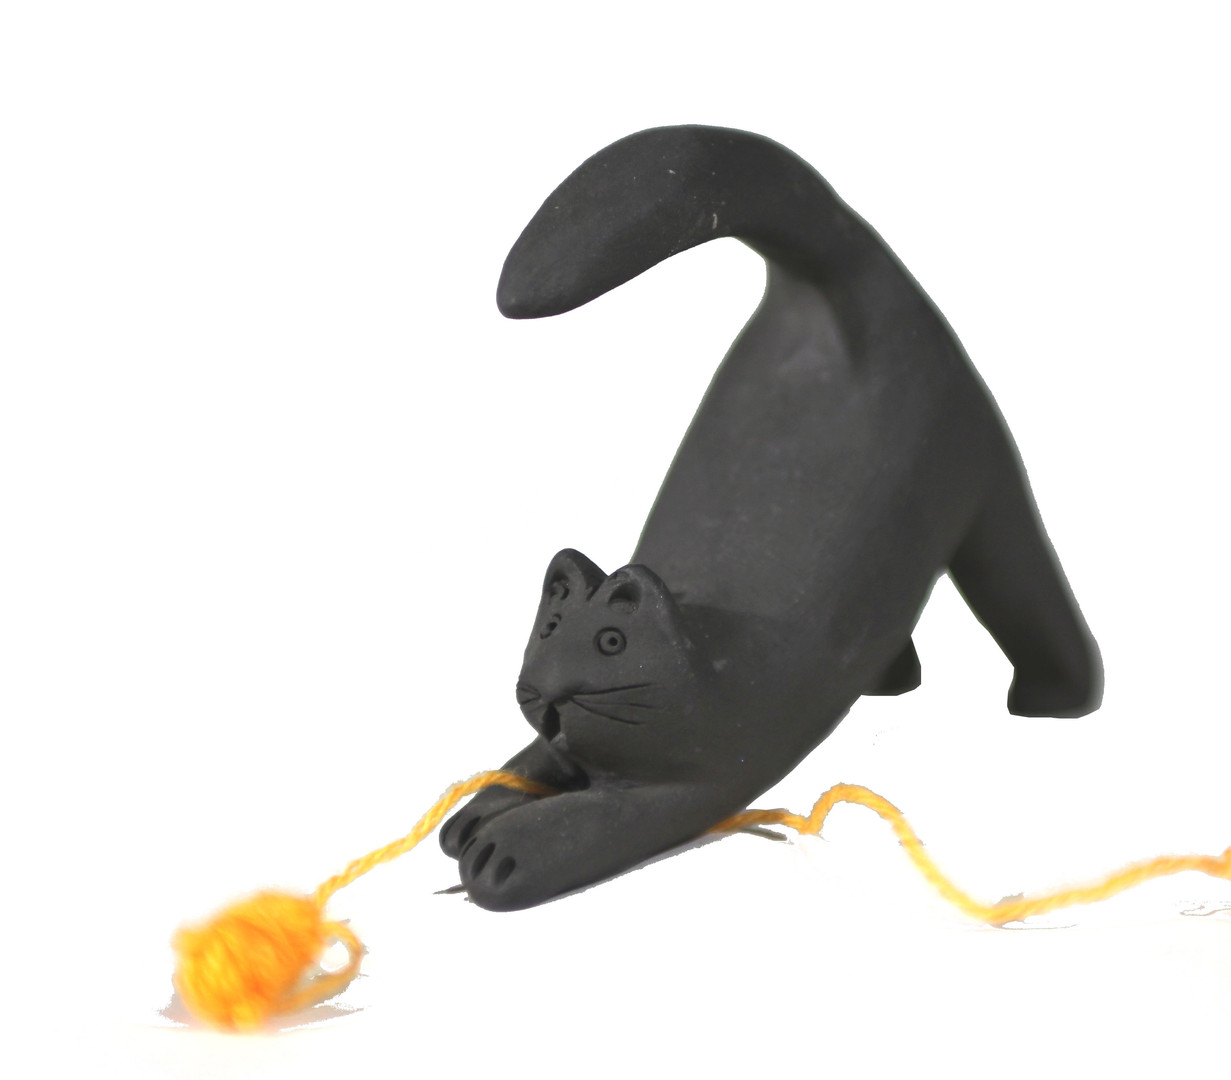 gattino 1 cm. 9